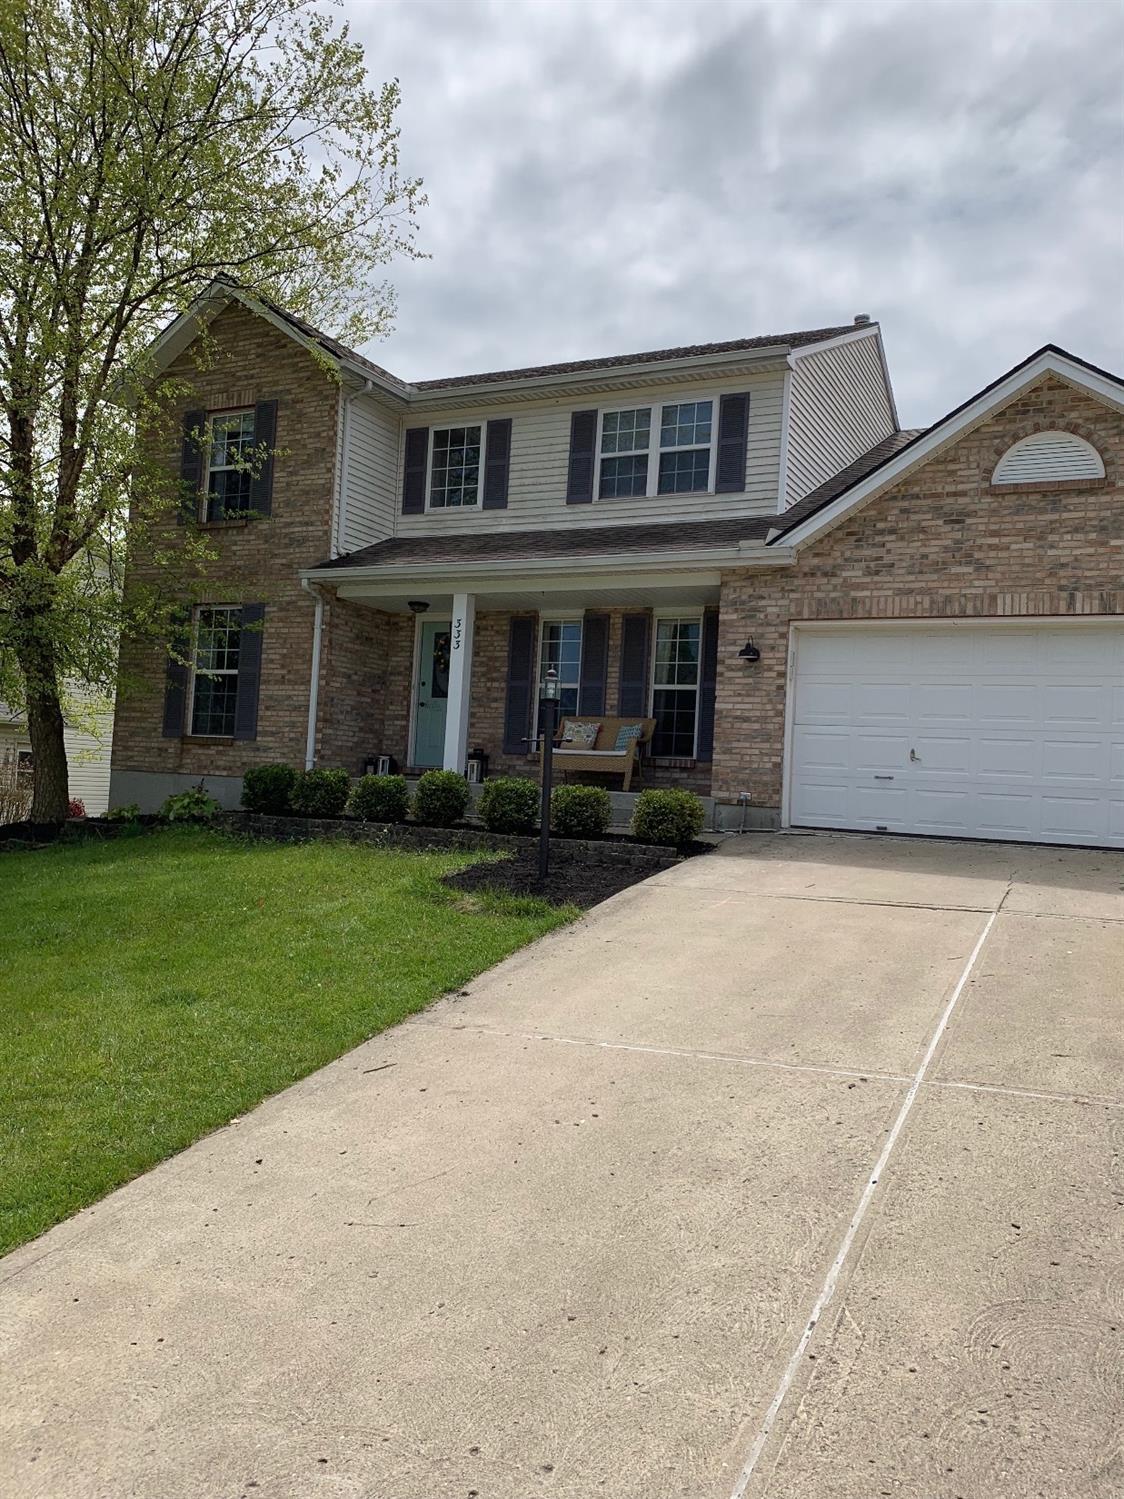 Property for sale at 333 Saratoga Court, Lebanon,  Ohio 45036